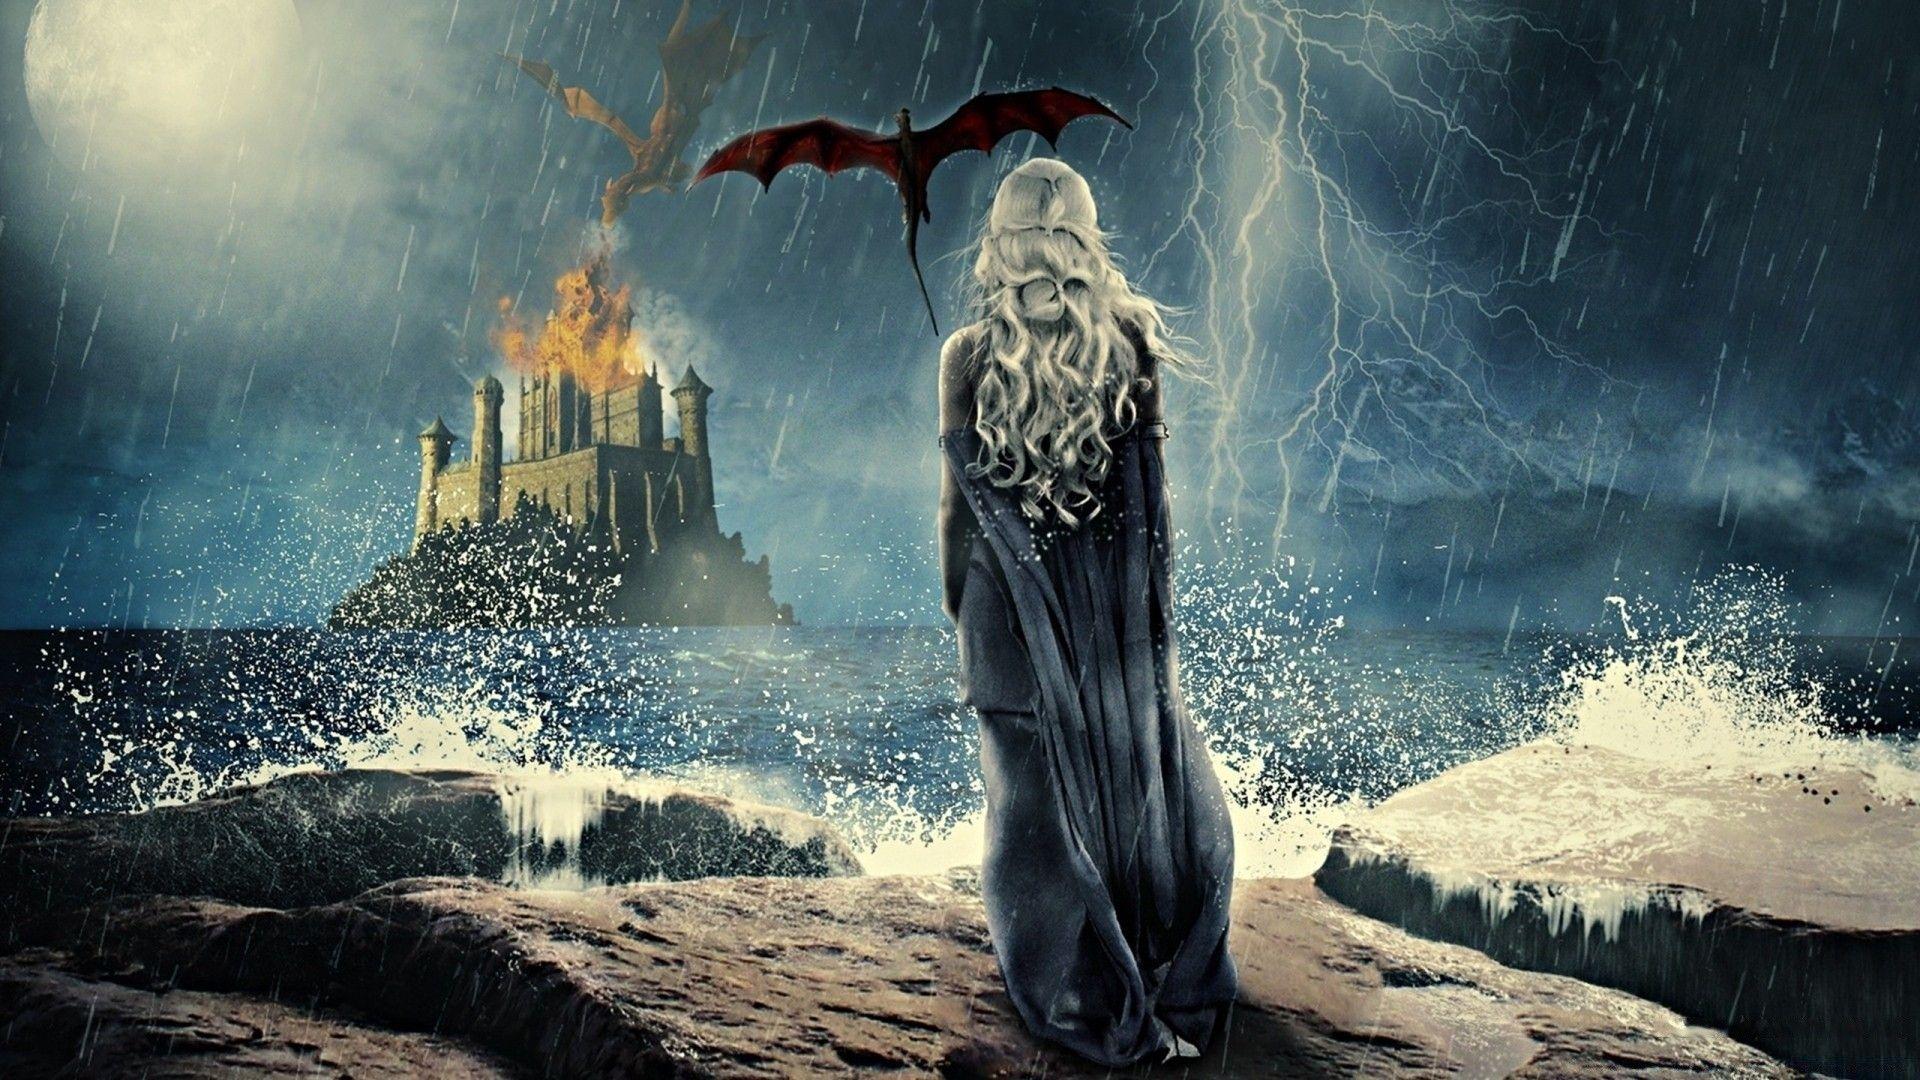 Game of Thrones Daenerys Targaryen with dragon in rain fan art